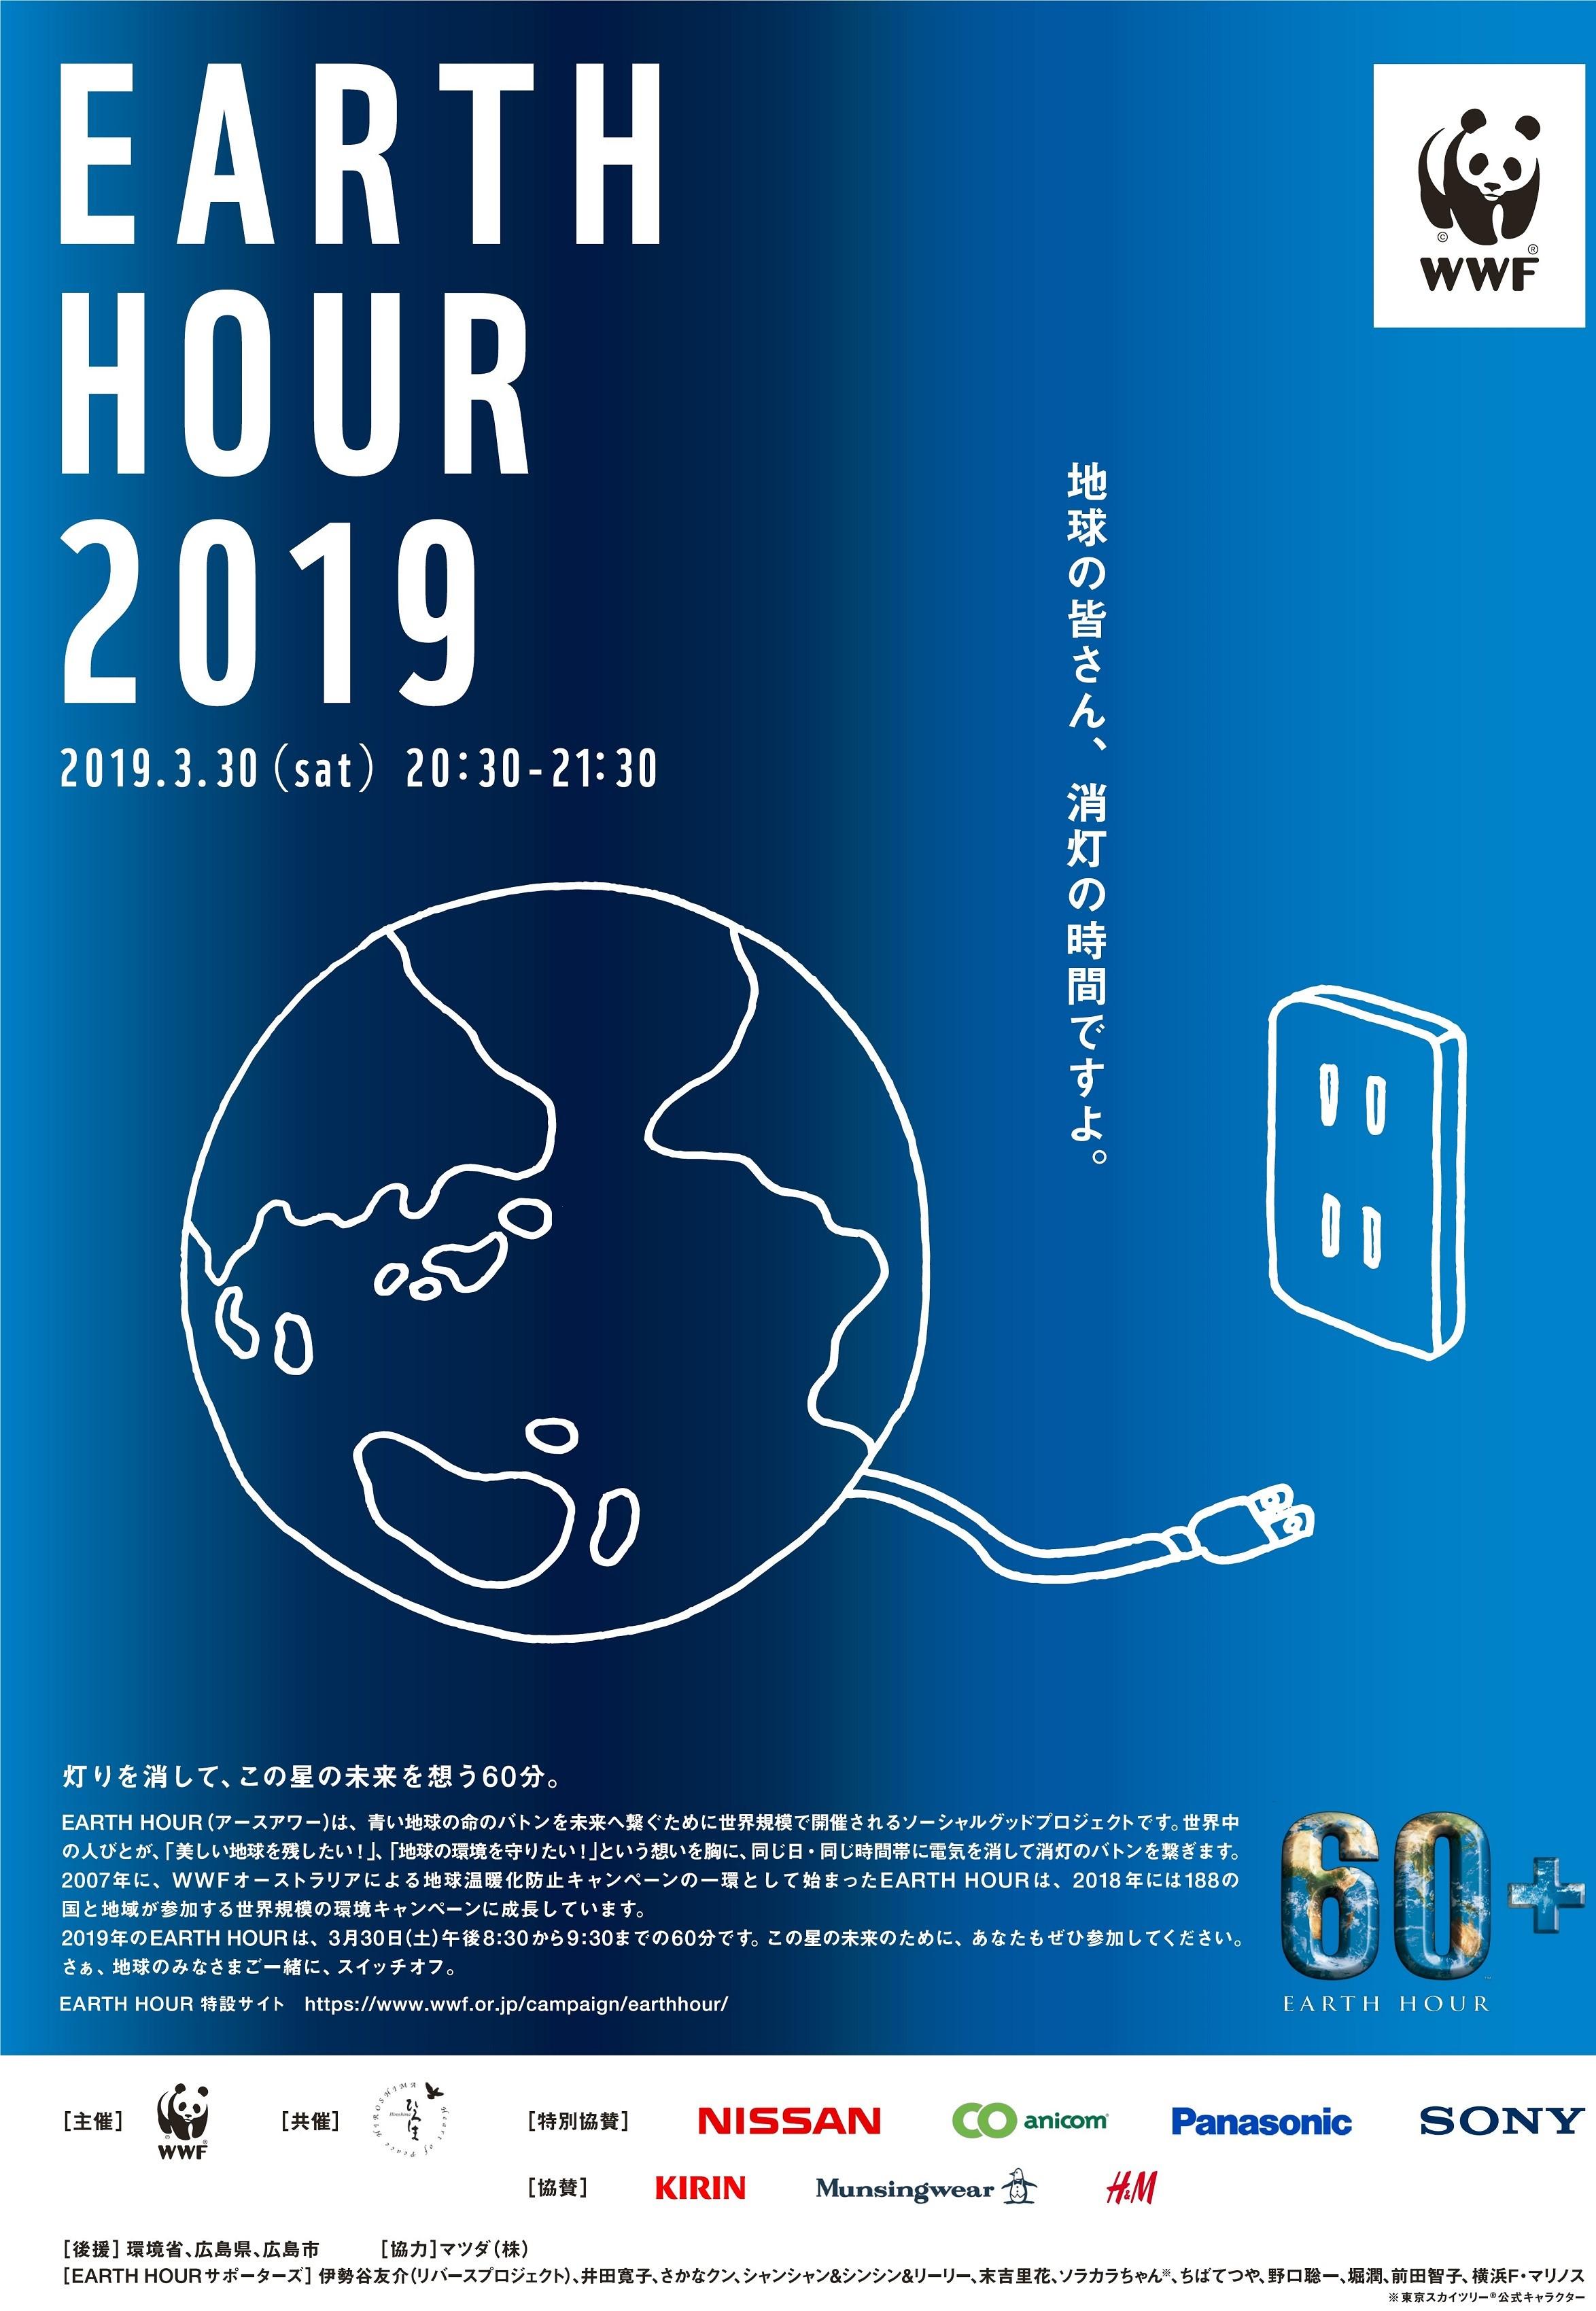 EARTH HOUR 2019 チラシ表